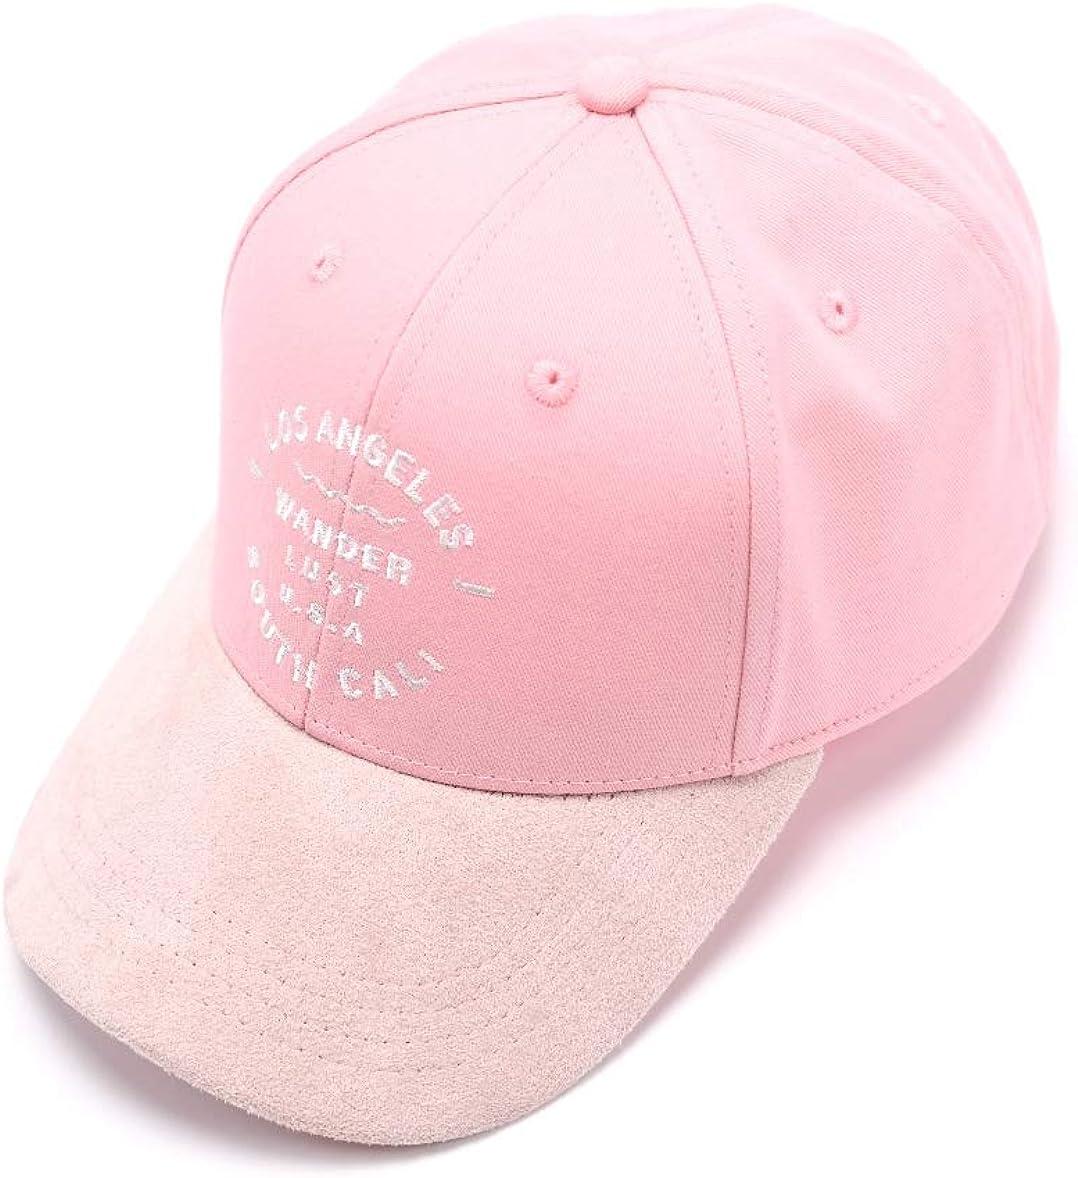 accsa Summer Women Baseball Cap UPF Protection Trucker Sun Hat Adjustable